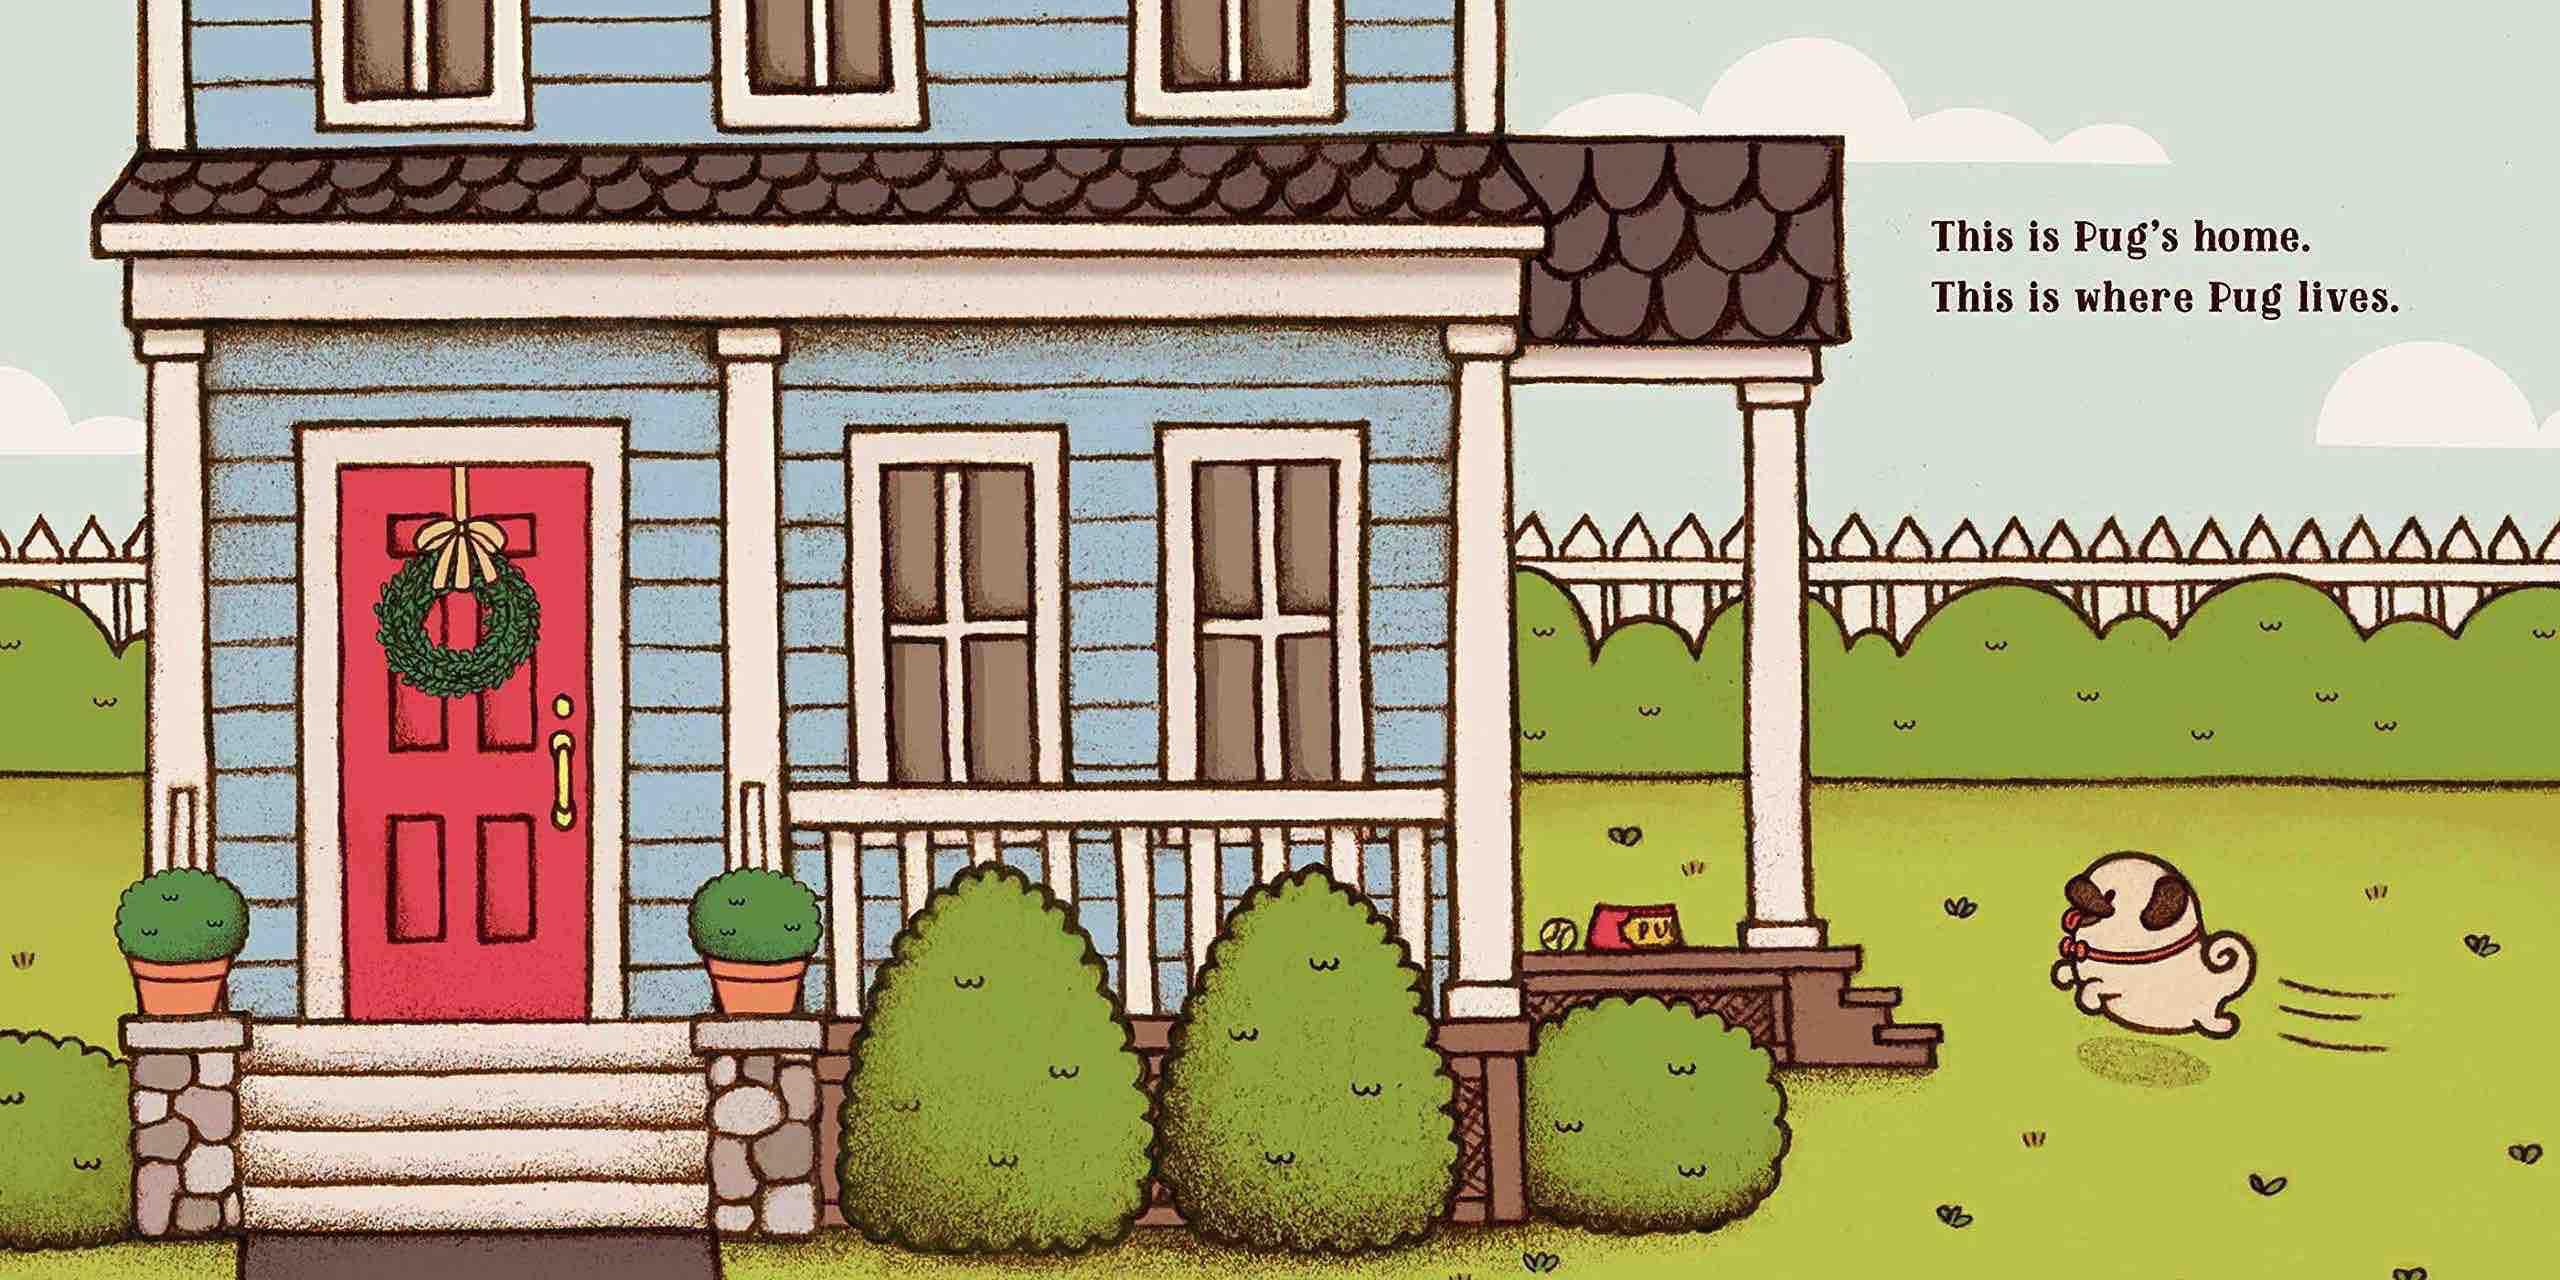 pug-meets-pig-illustration